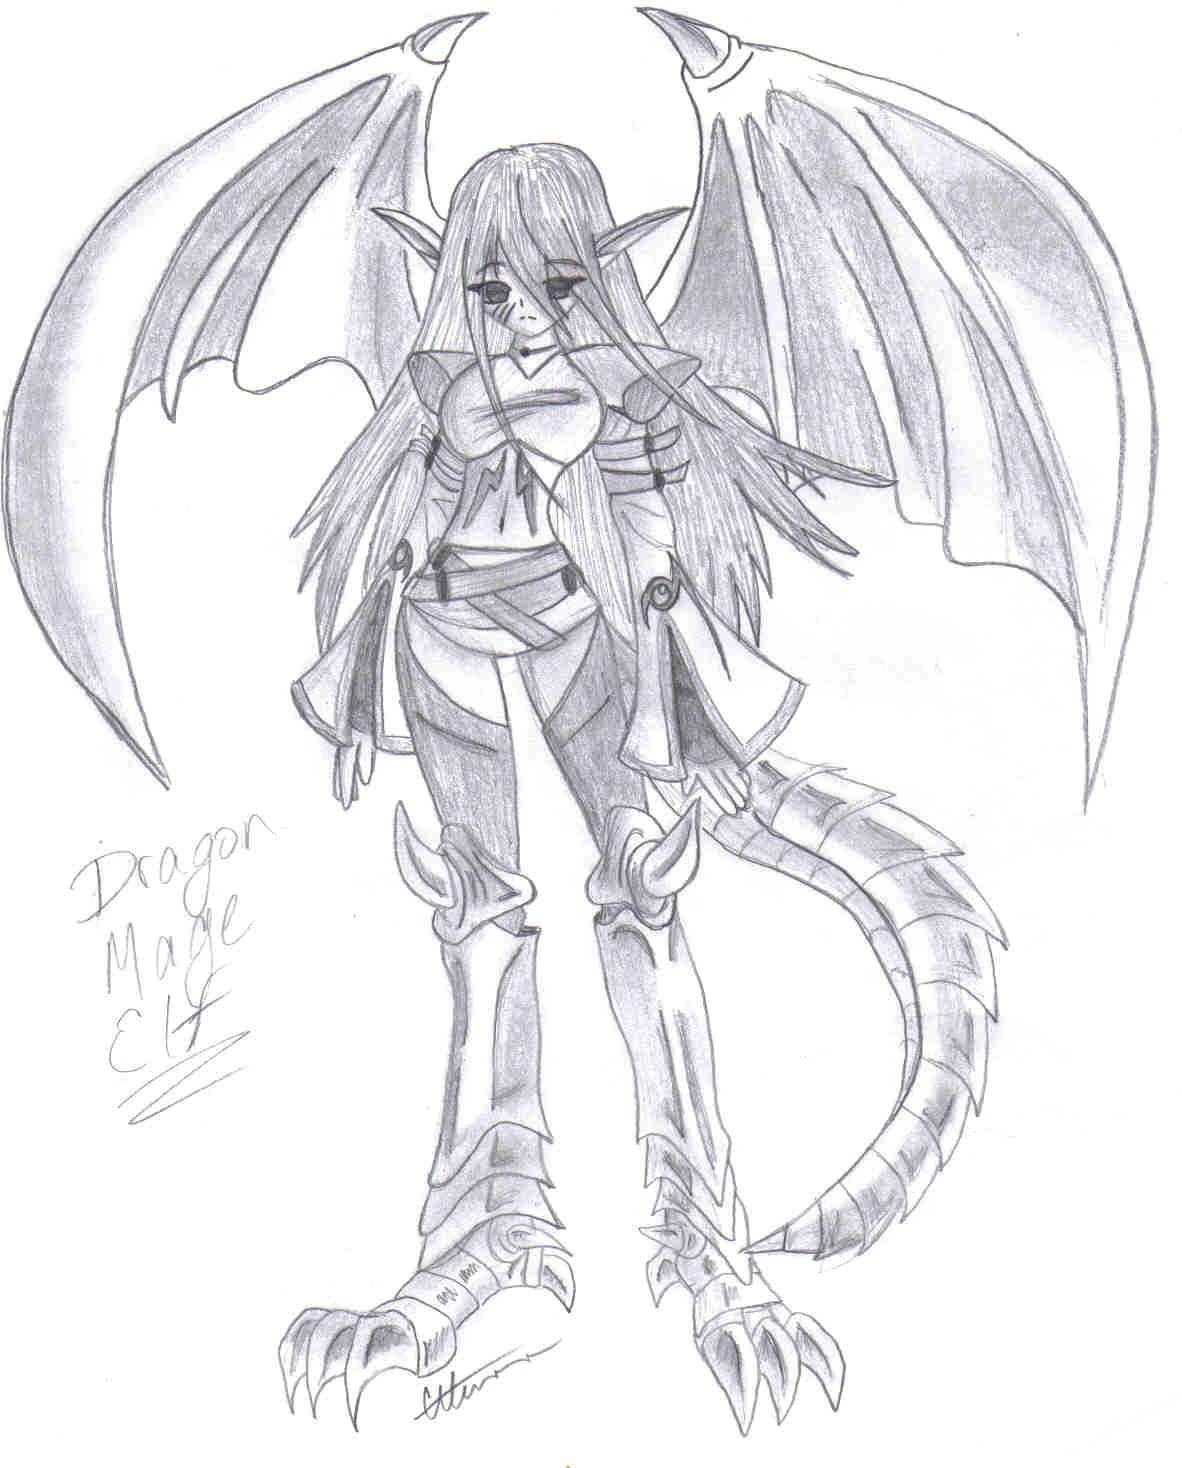 A cool dragon girl by Corky-Lunn on DeviantArt